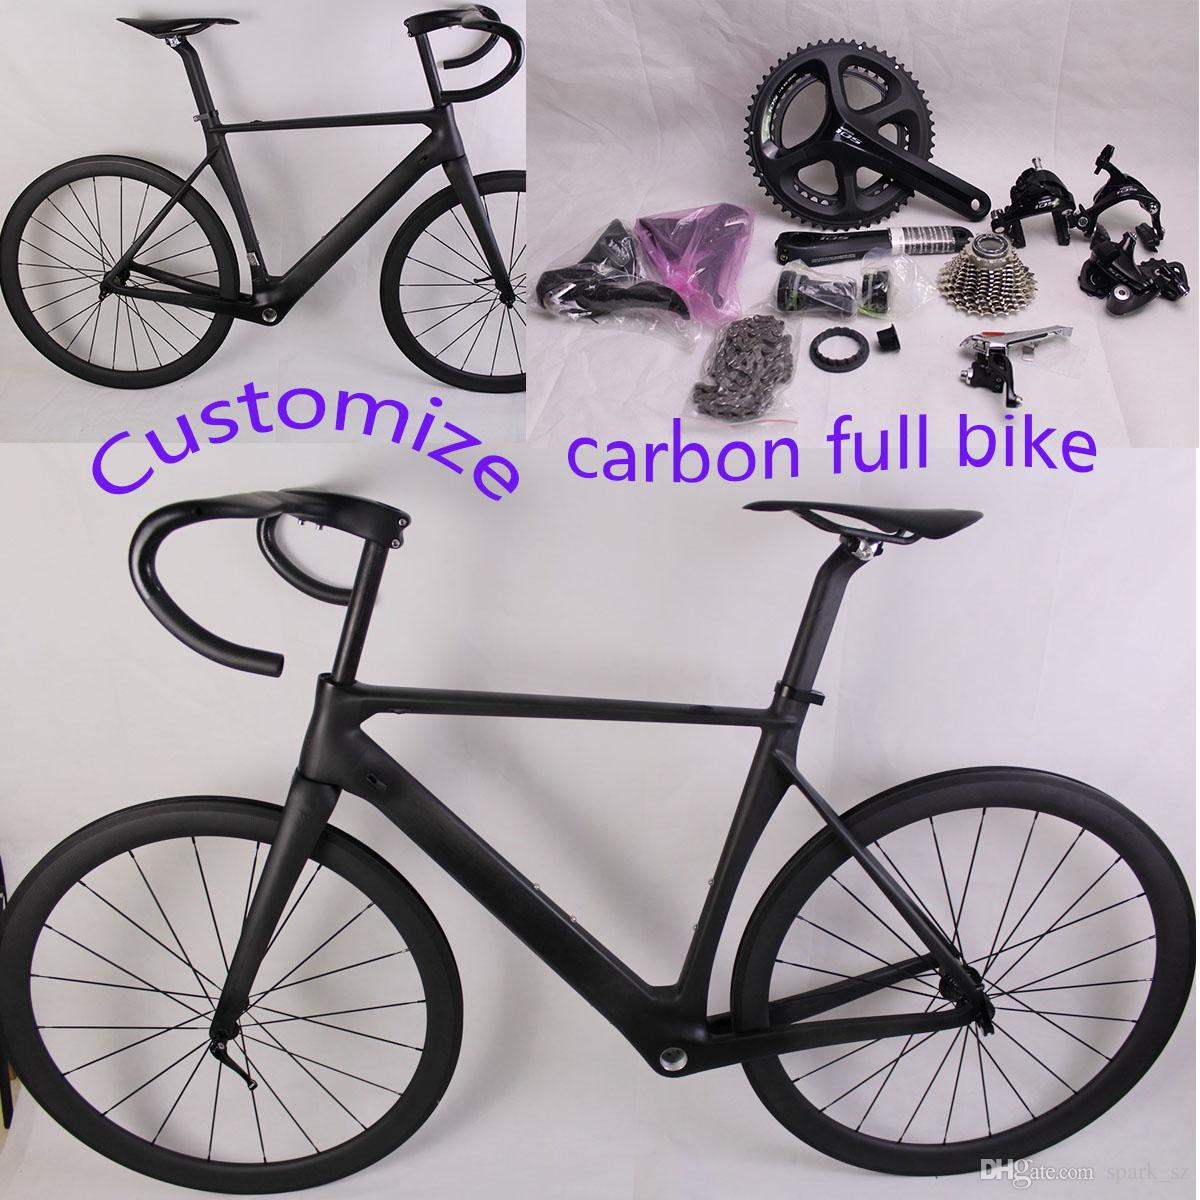 Carbon Complete Road Bike with Original Ultegra Groupset Carbon Full ...